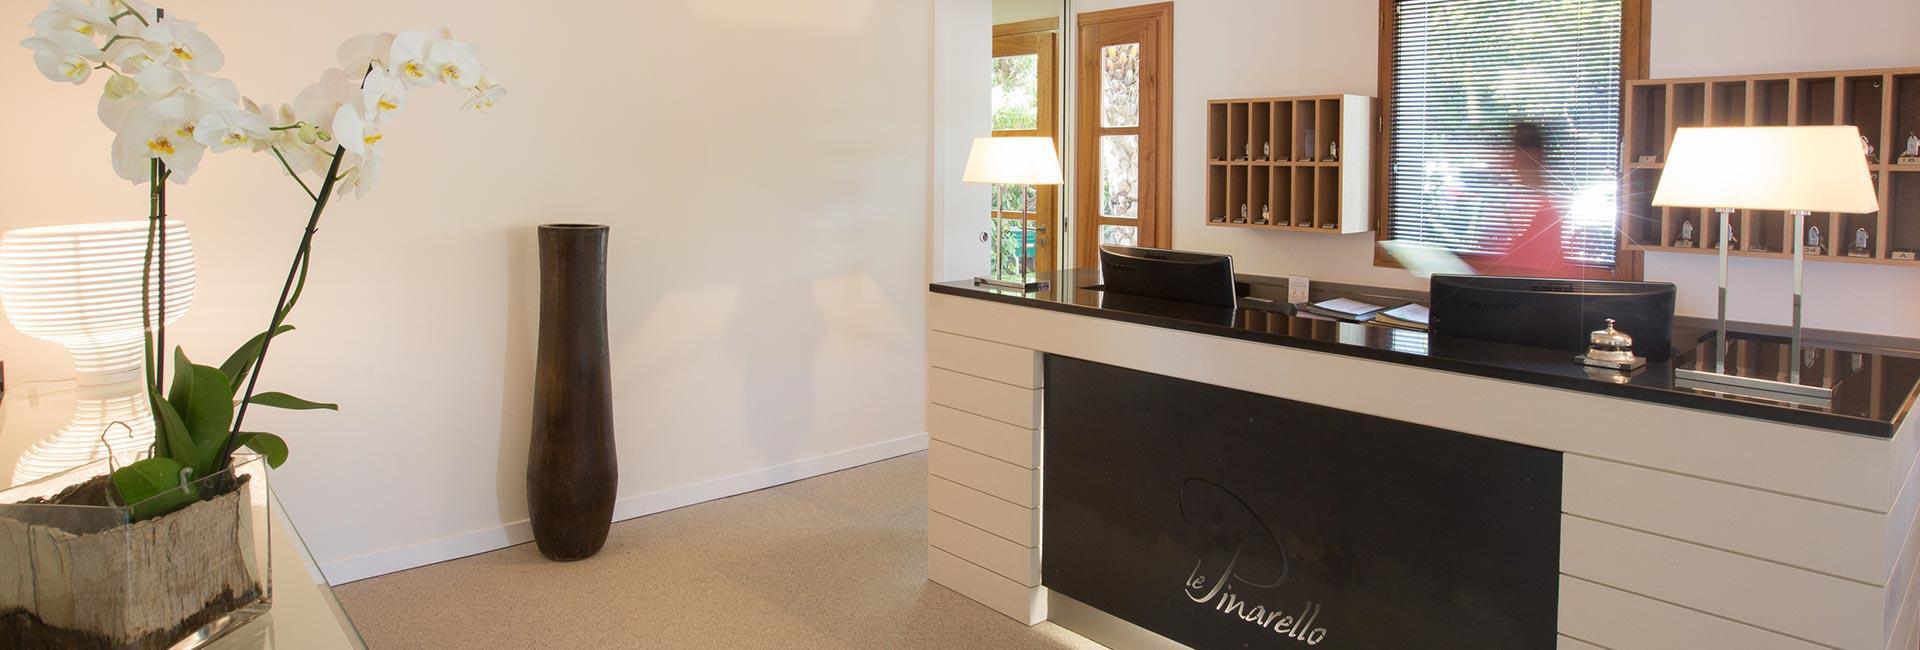 Reception hôtel le Pinarello à Porto-Vecchio en Corse du Sud